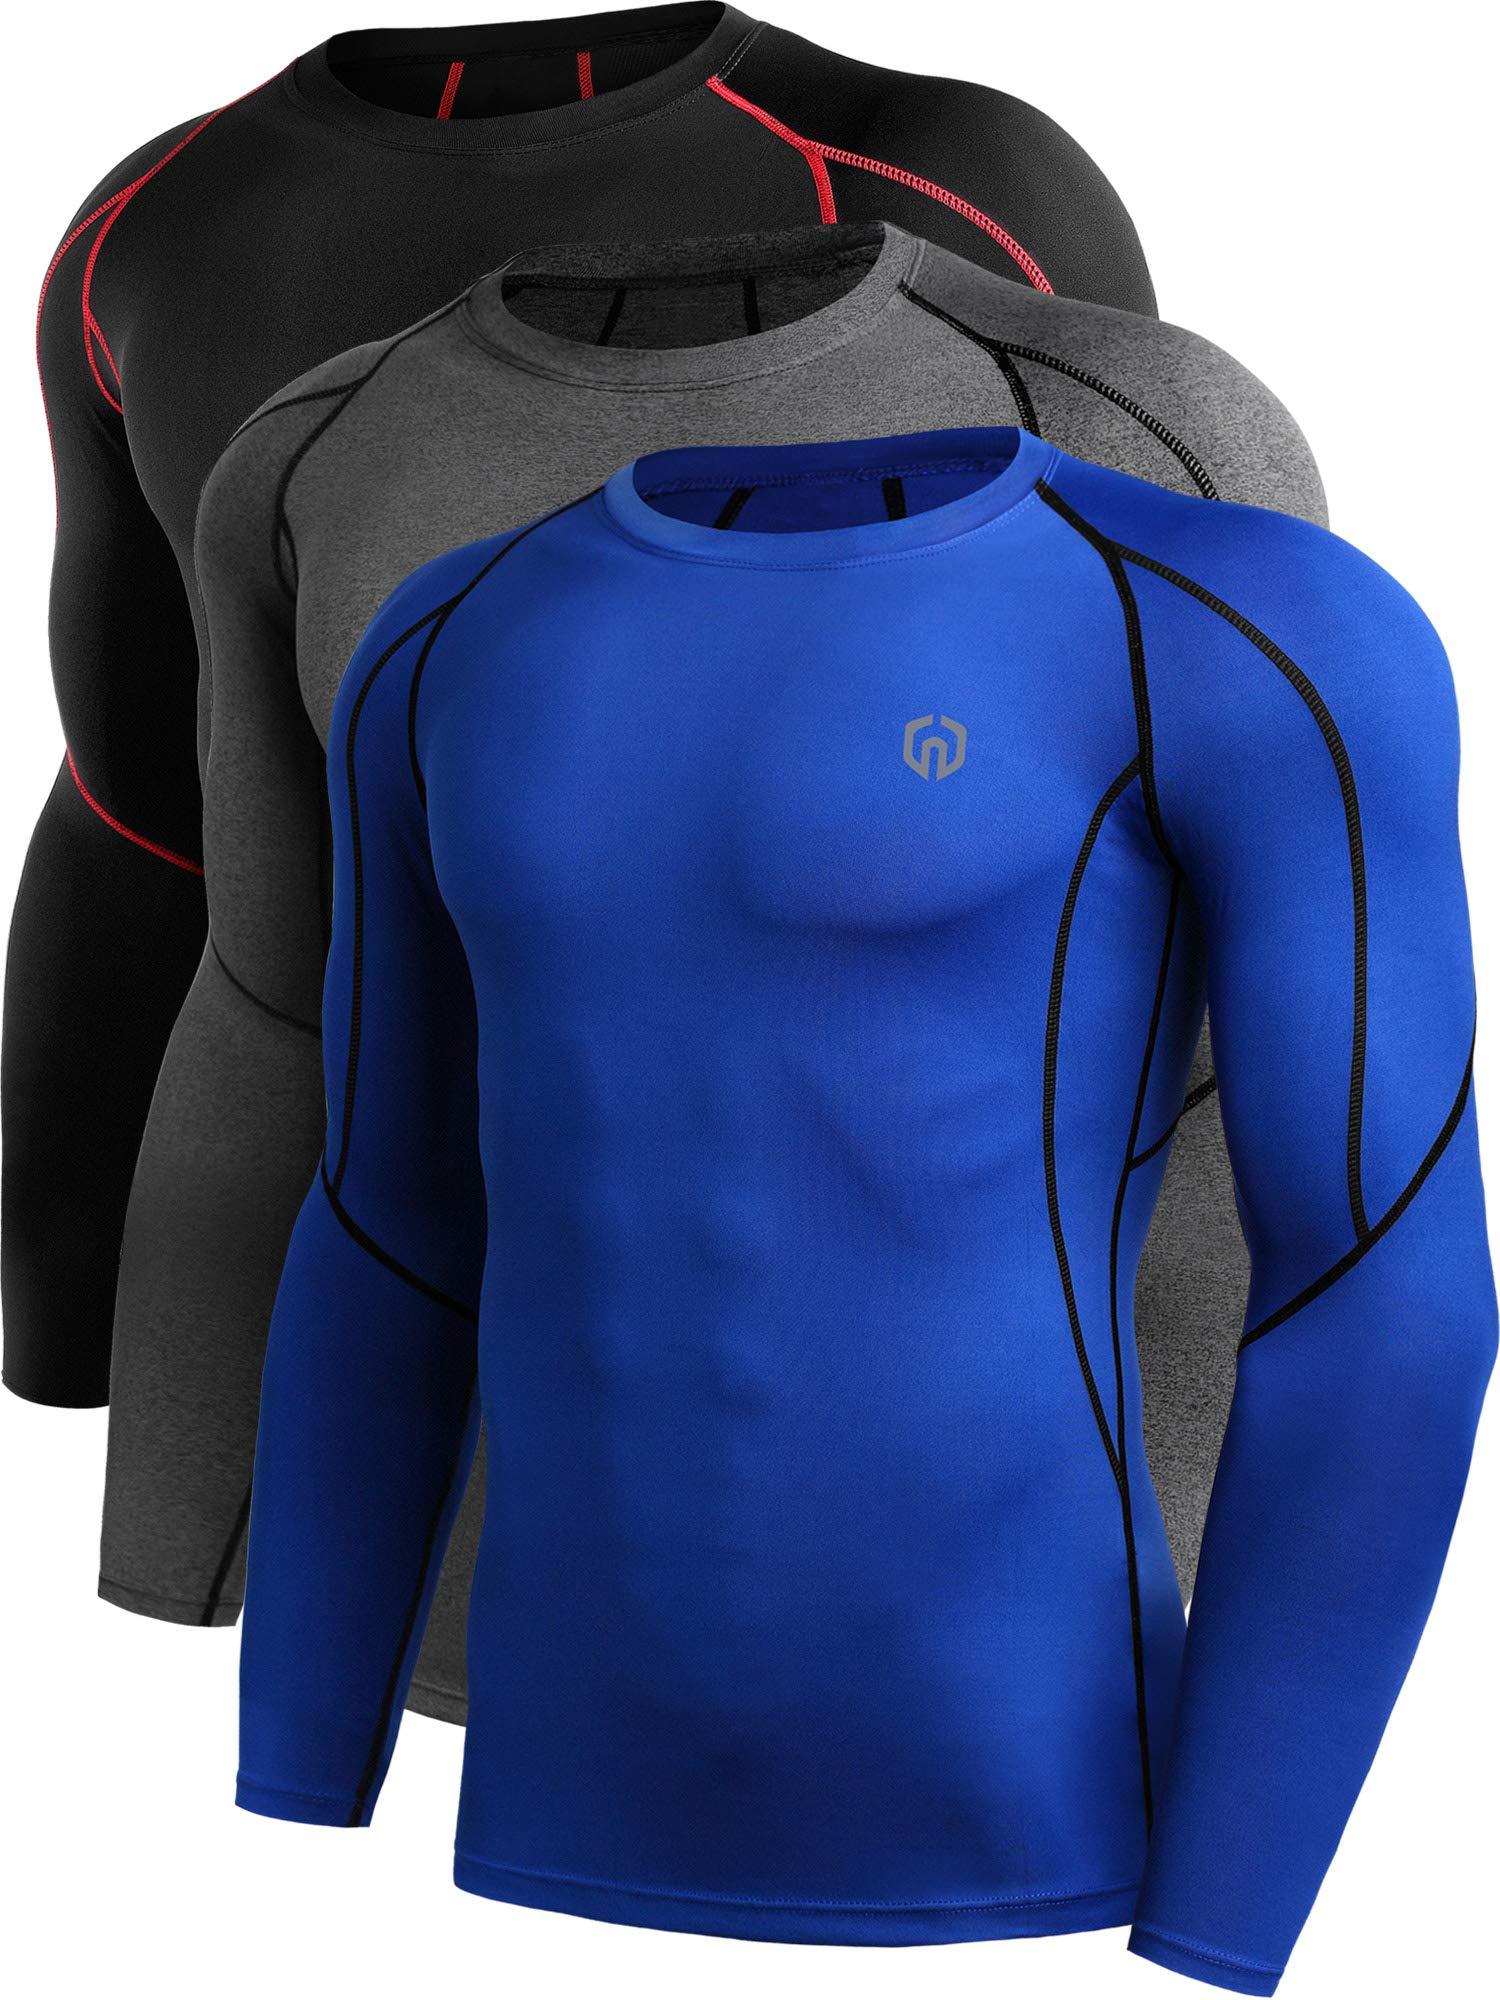 Neleus Men's 3 Pack Compression Workout Long Sleeve Shirts,5030,Black (Red Stripe),Grey,Blue,US 2XL,EU 3XL by Neleus